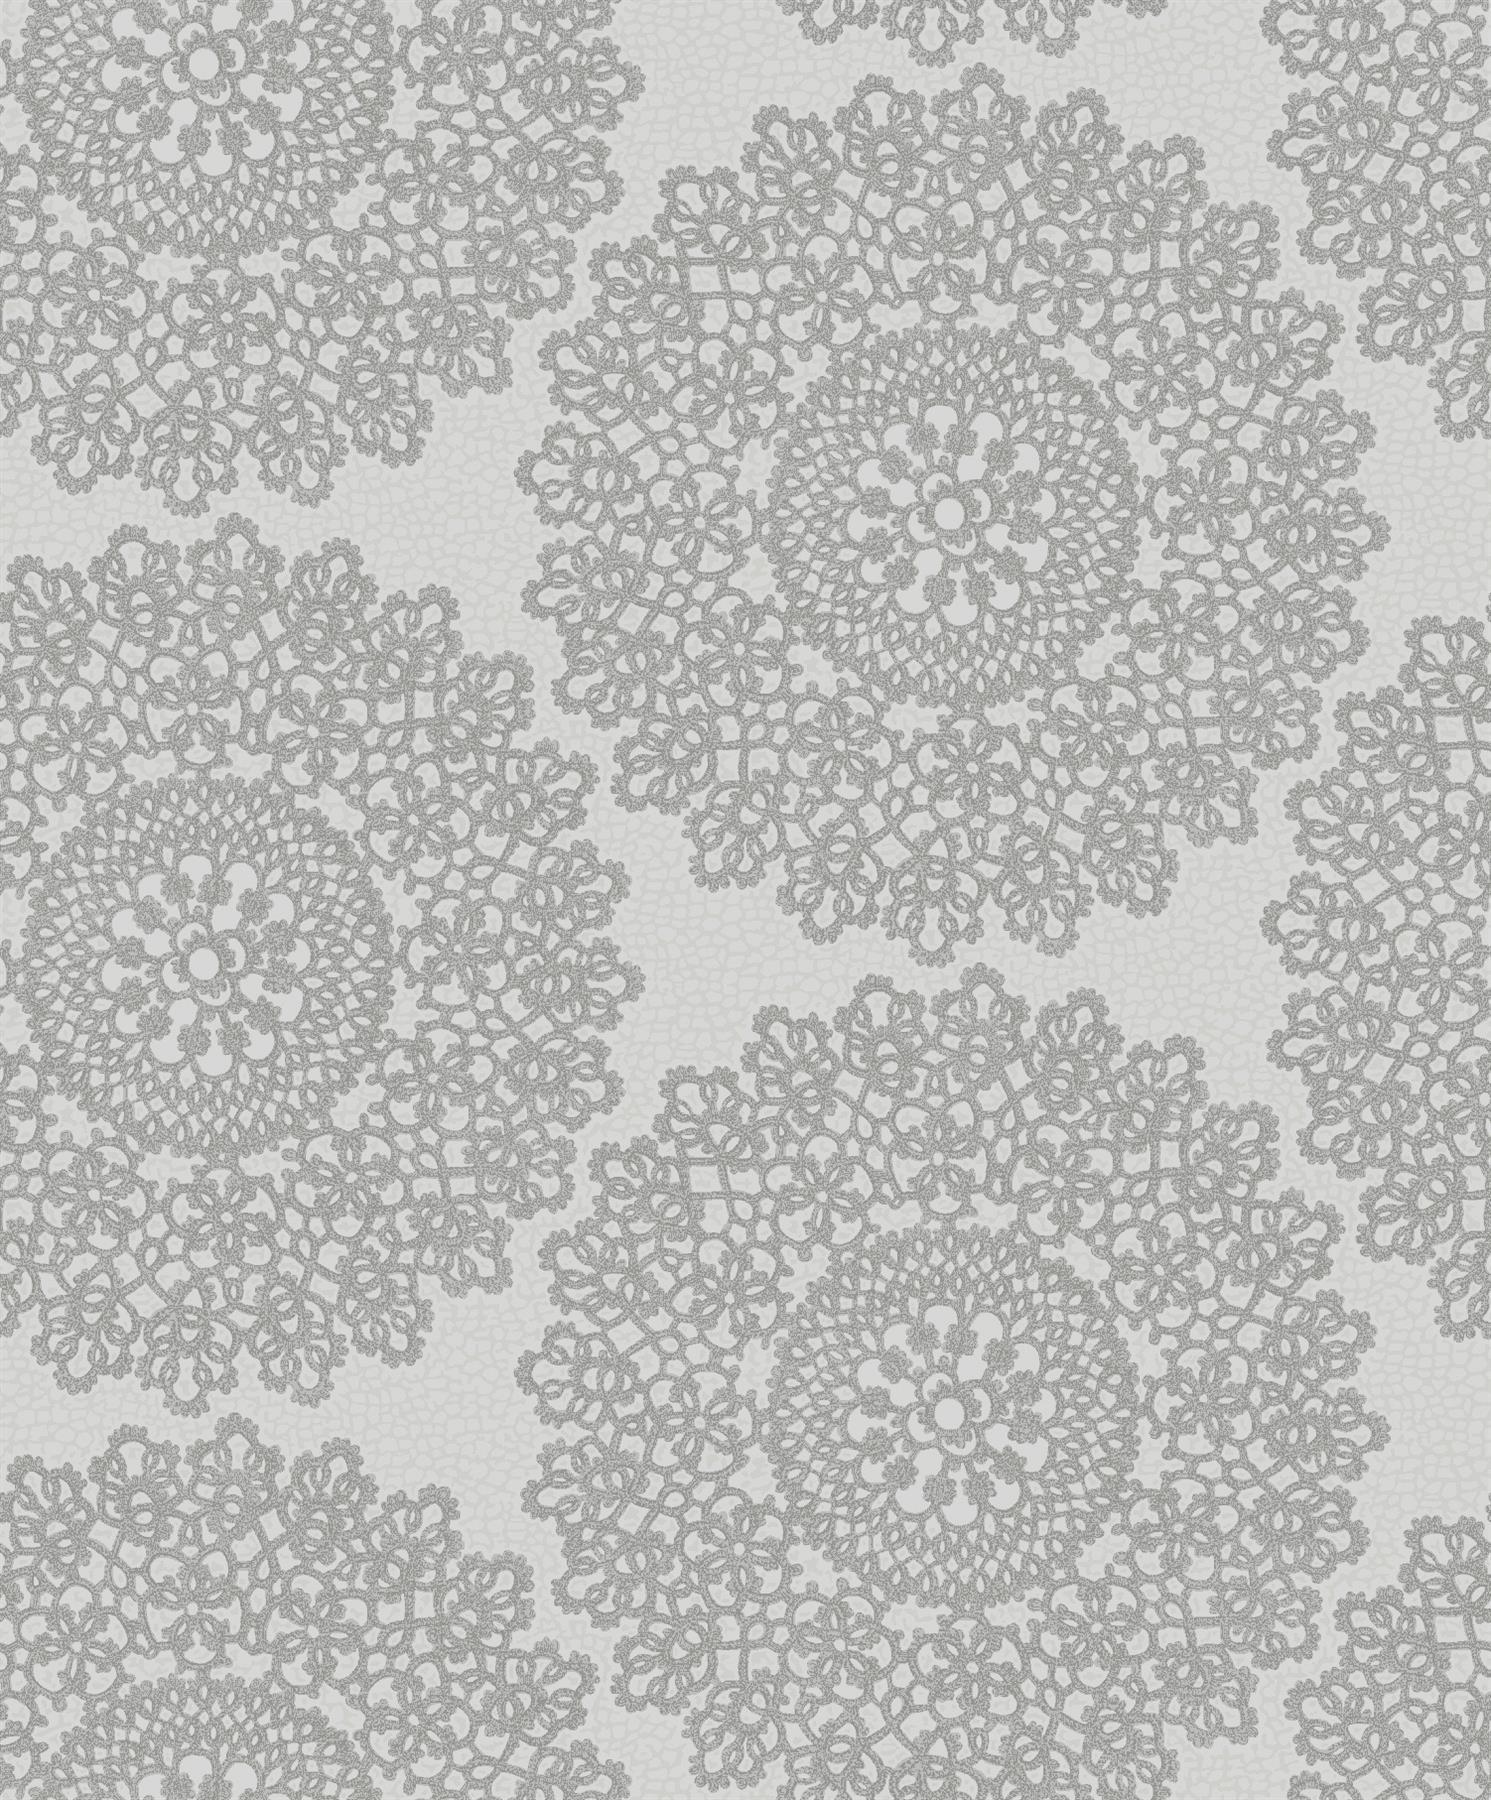 Alexander Damask Wallpaper Floral Ornament Silver Metallic Off White Grey Holden